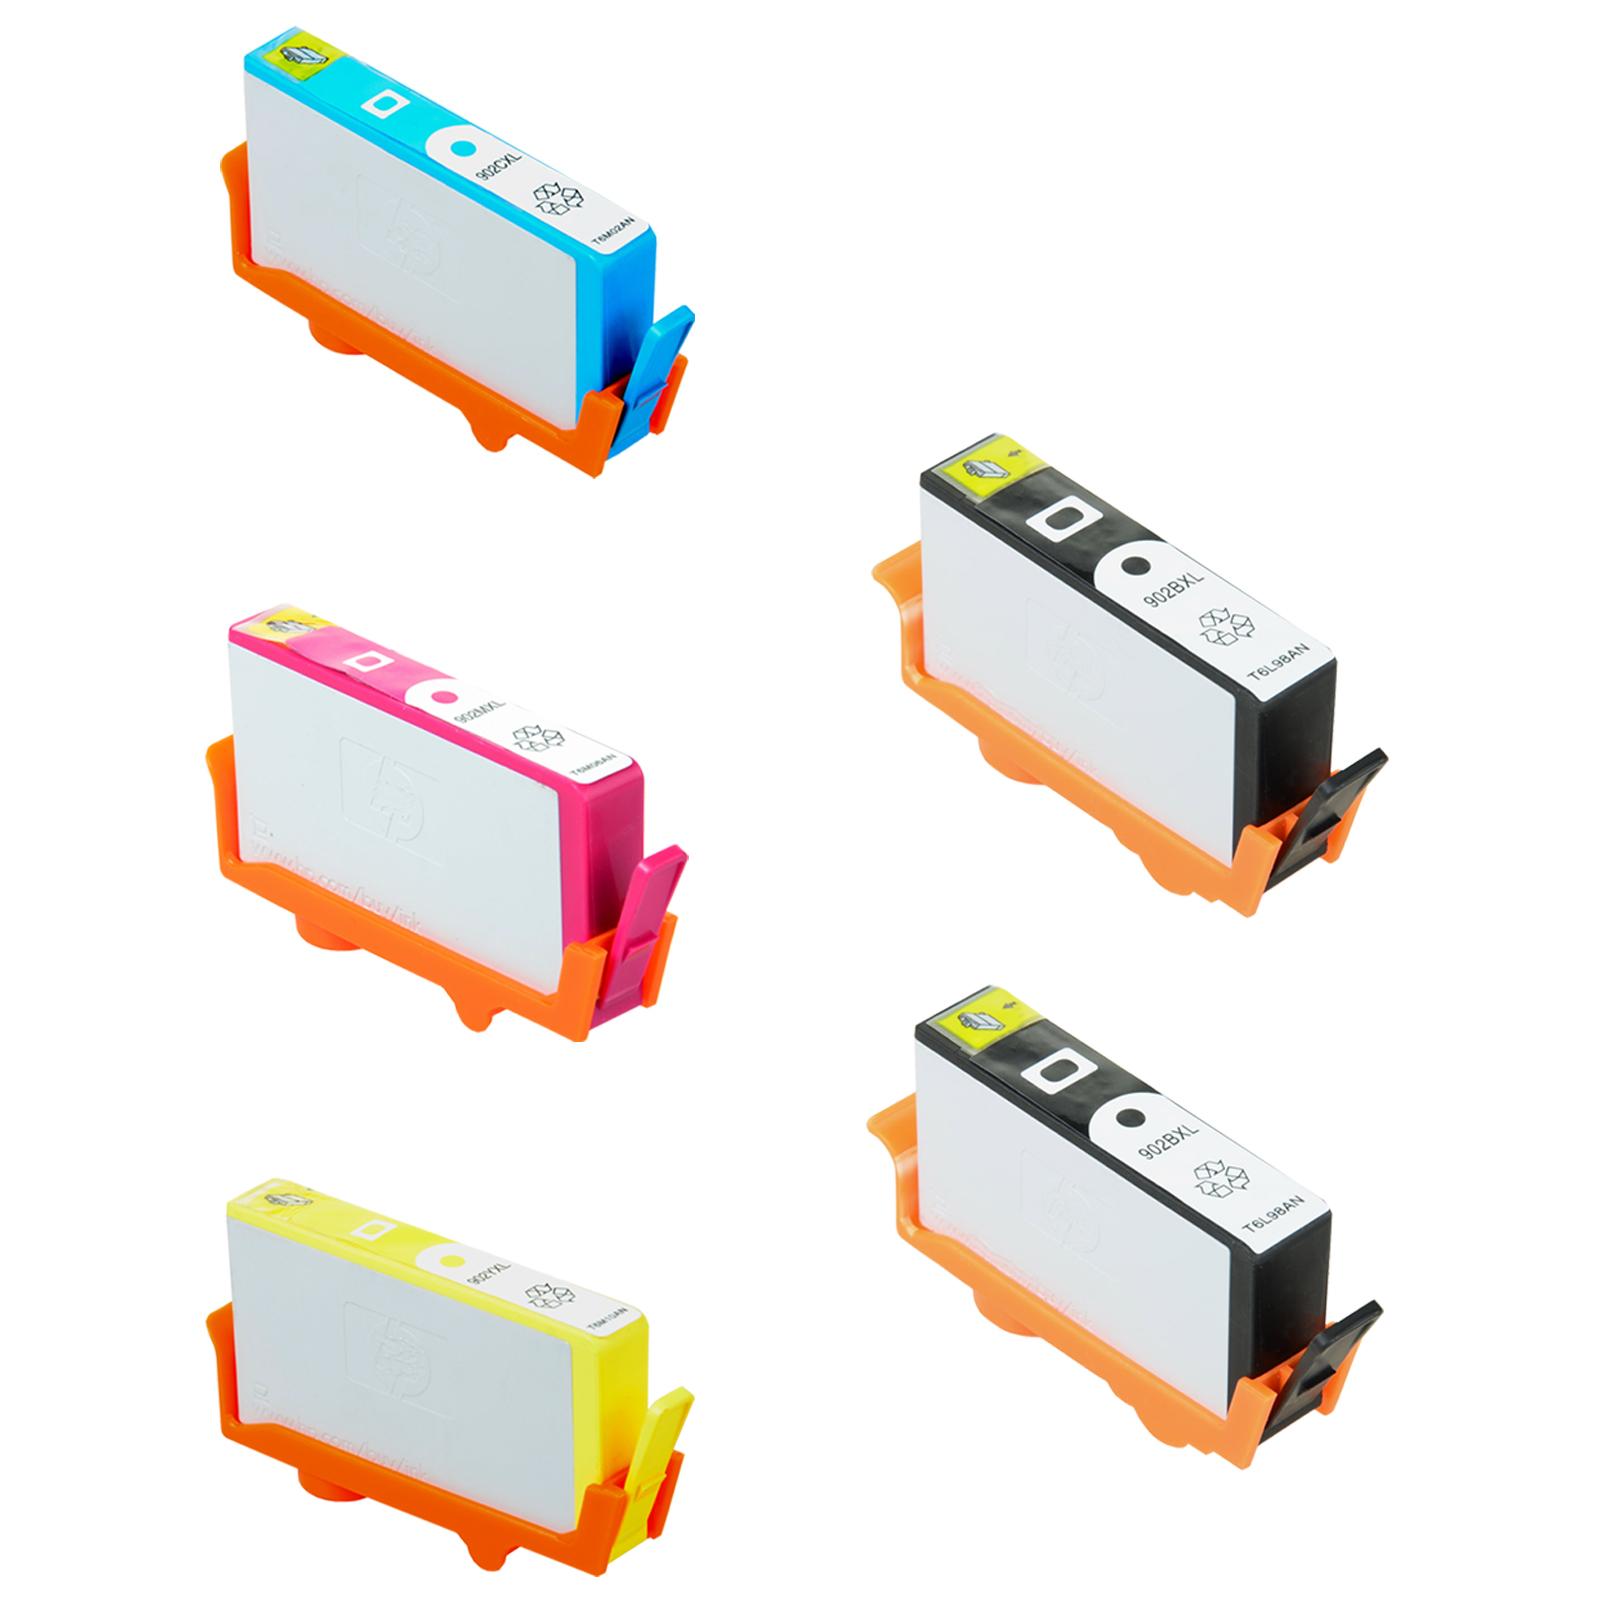 5Pk Compatible Ink Cartridge Set for HP 902 OfficeJet Pro 6960 6968 6970 6974